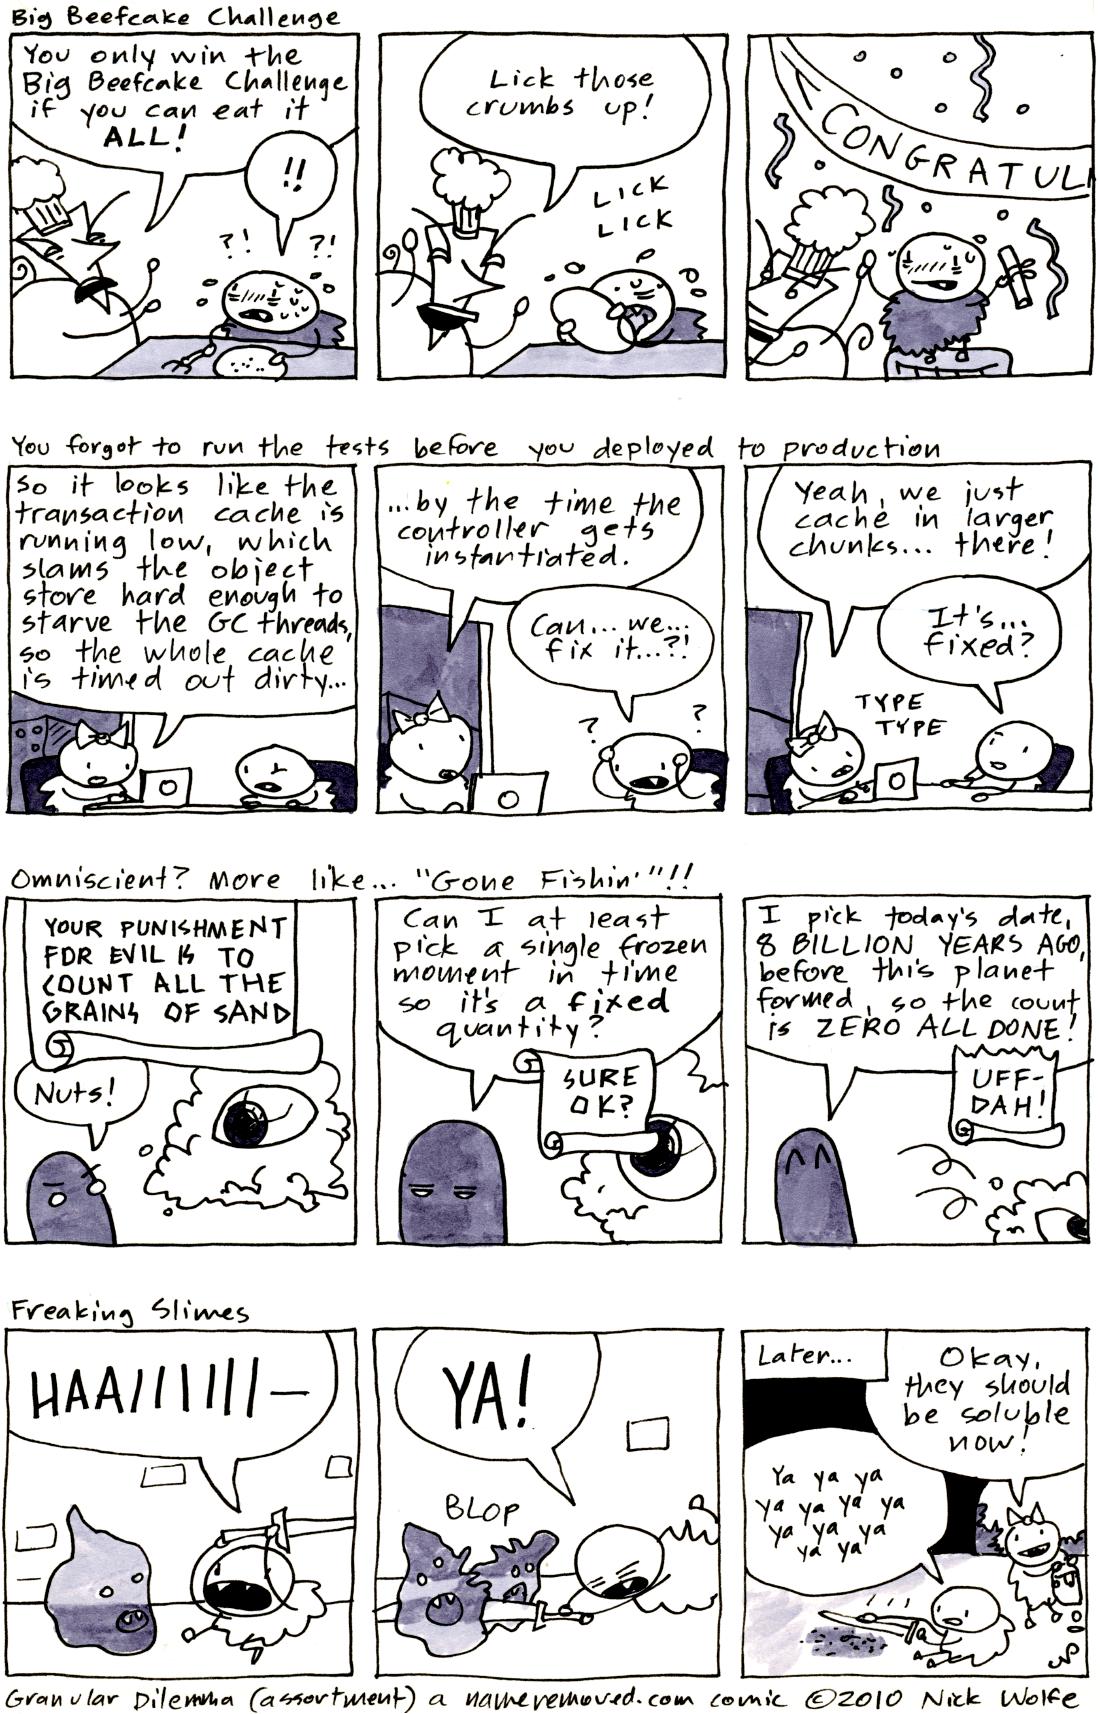 Granular Dilemma (assortment)